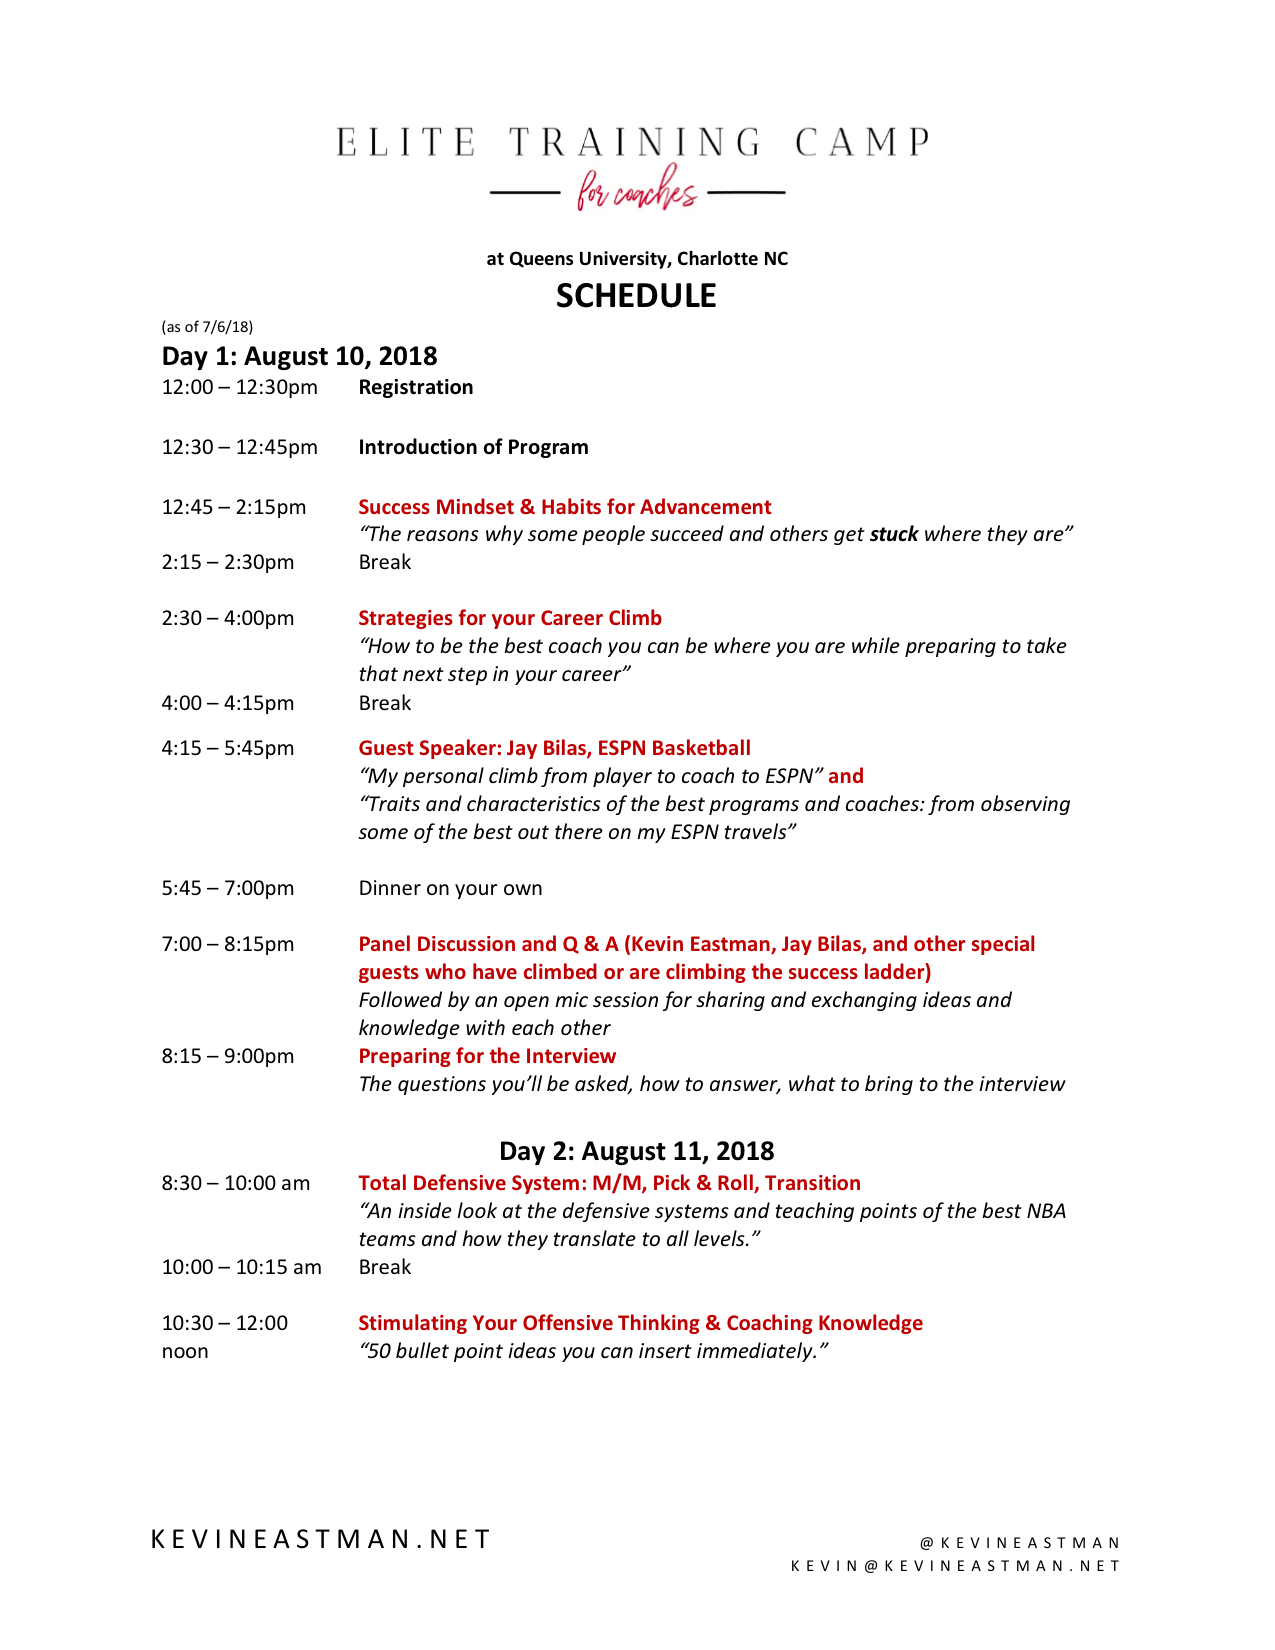 Elite Training Camp 2018 Schedule